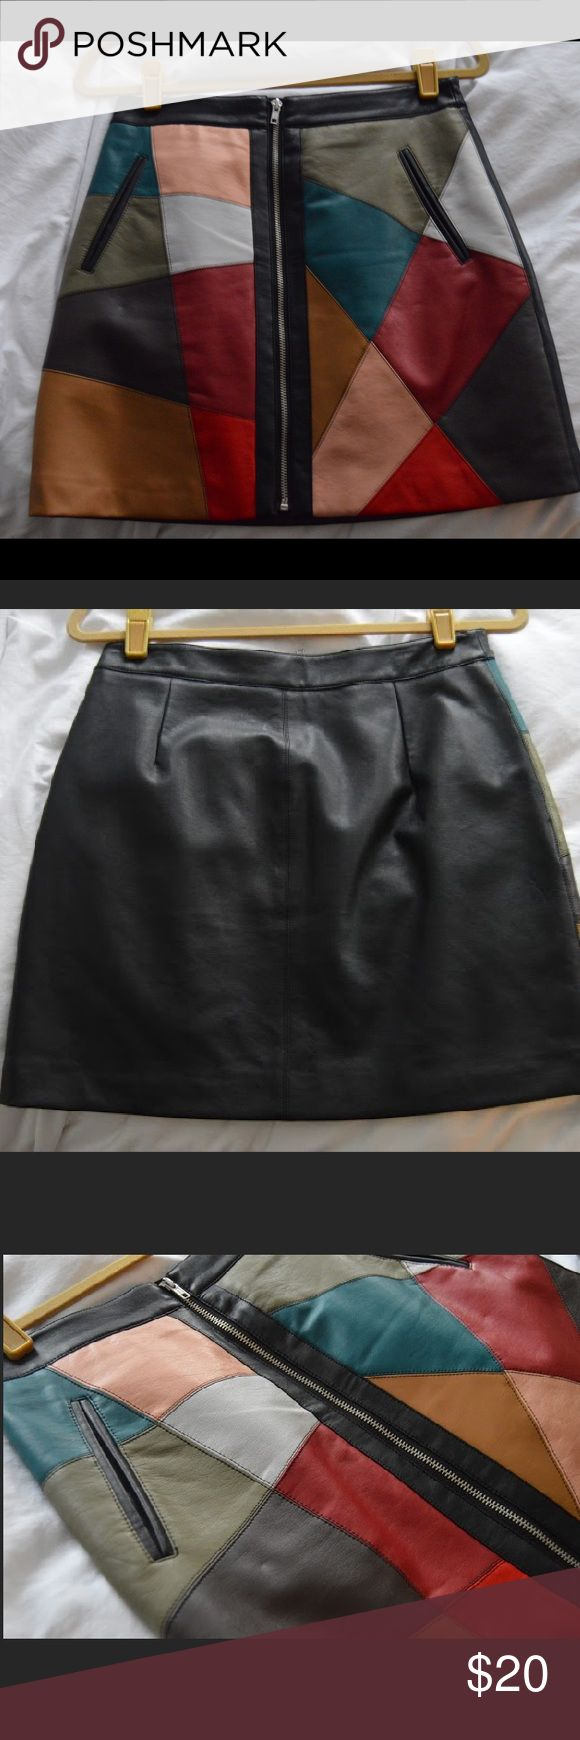 BCBGeneration Geometric Faux Leather Skirt NEVER WORN-- Super cute mini skirt from BCBGeneration. Skirt has geometric leather print, with zipper detail in the front. BCBGeneration Skirts Mini